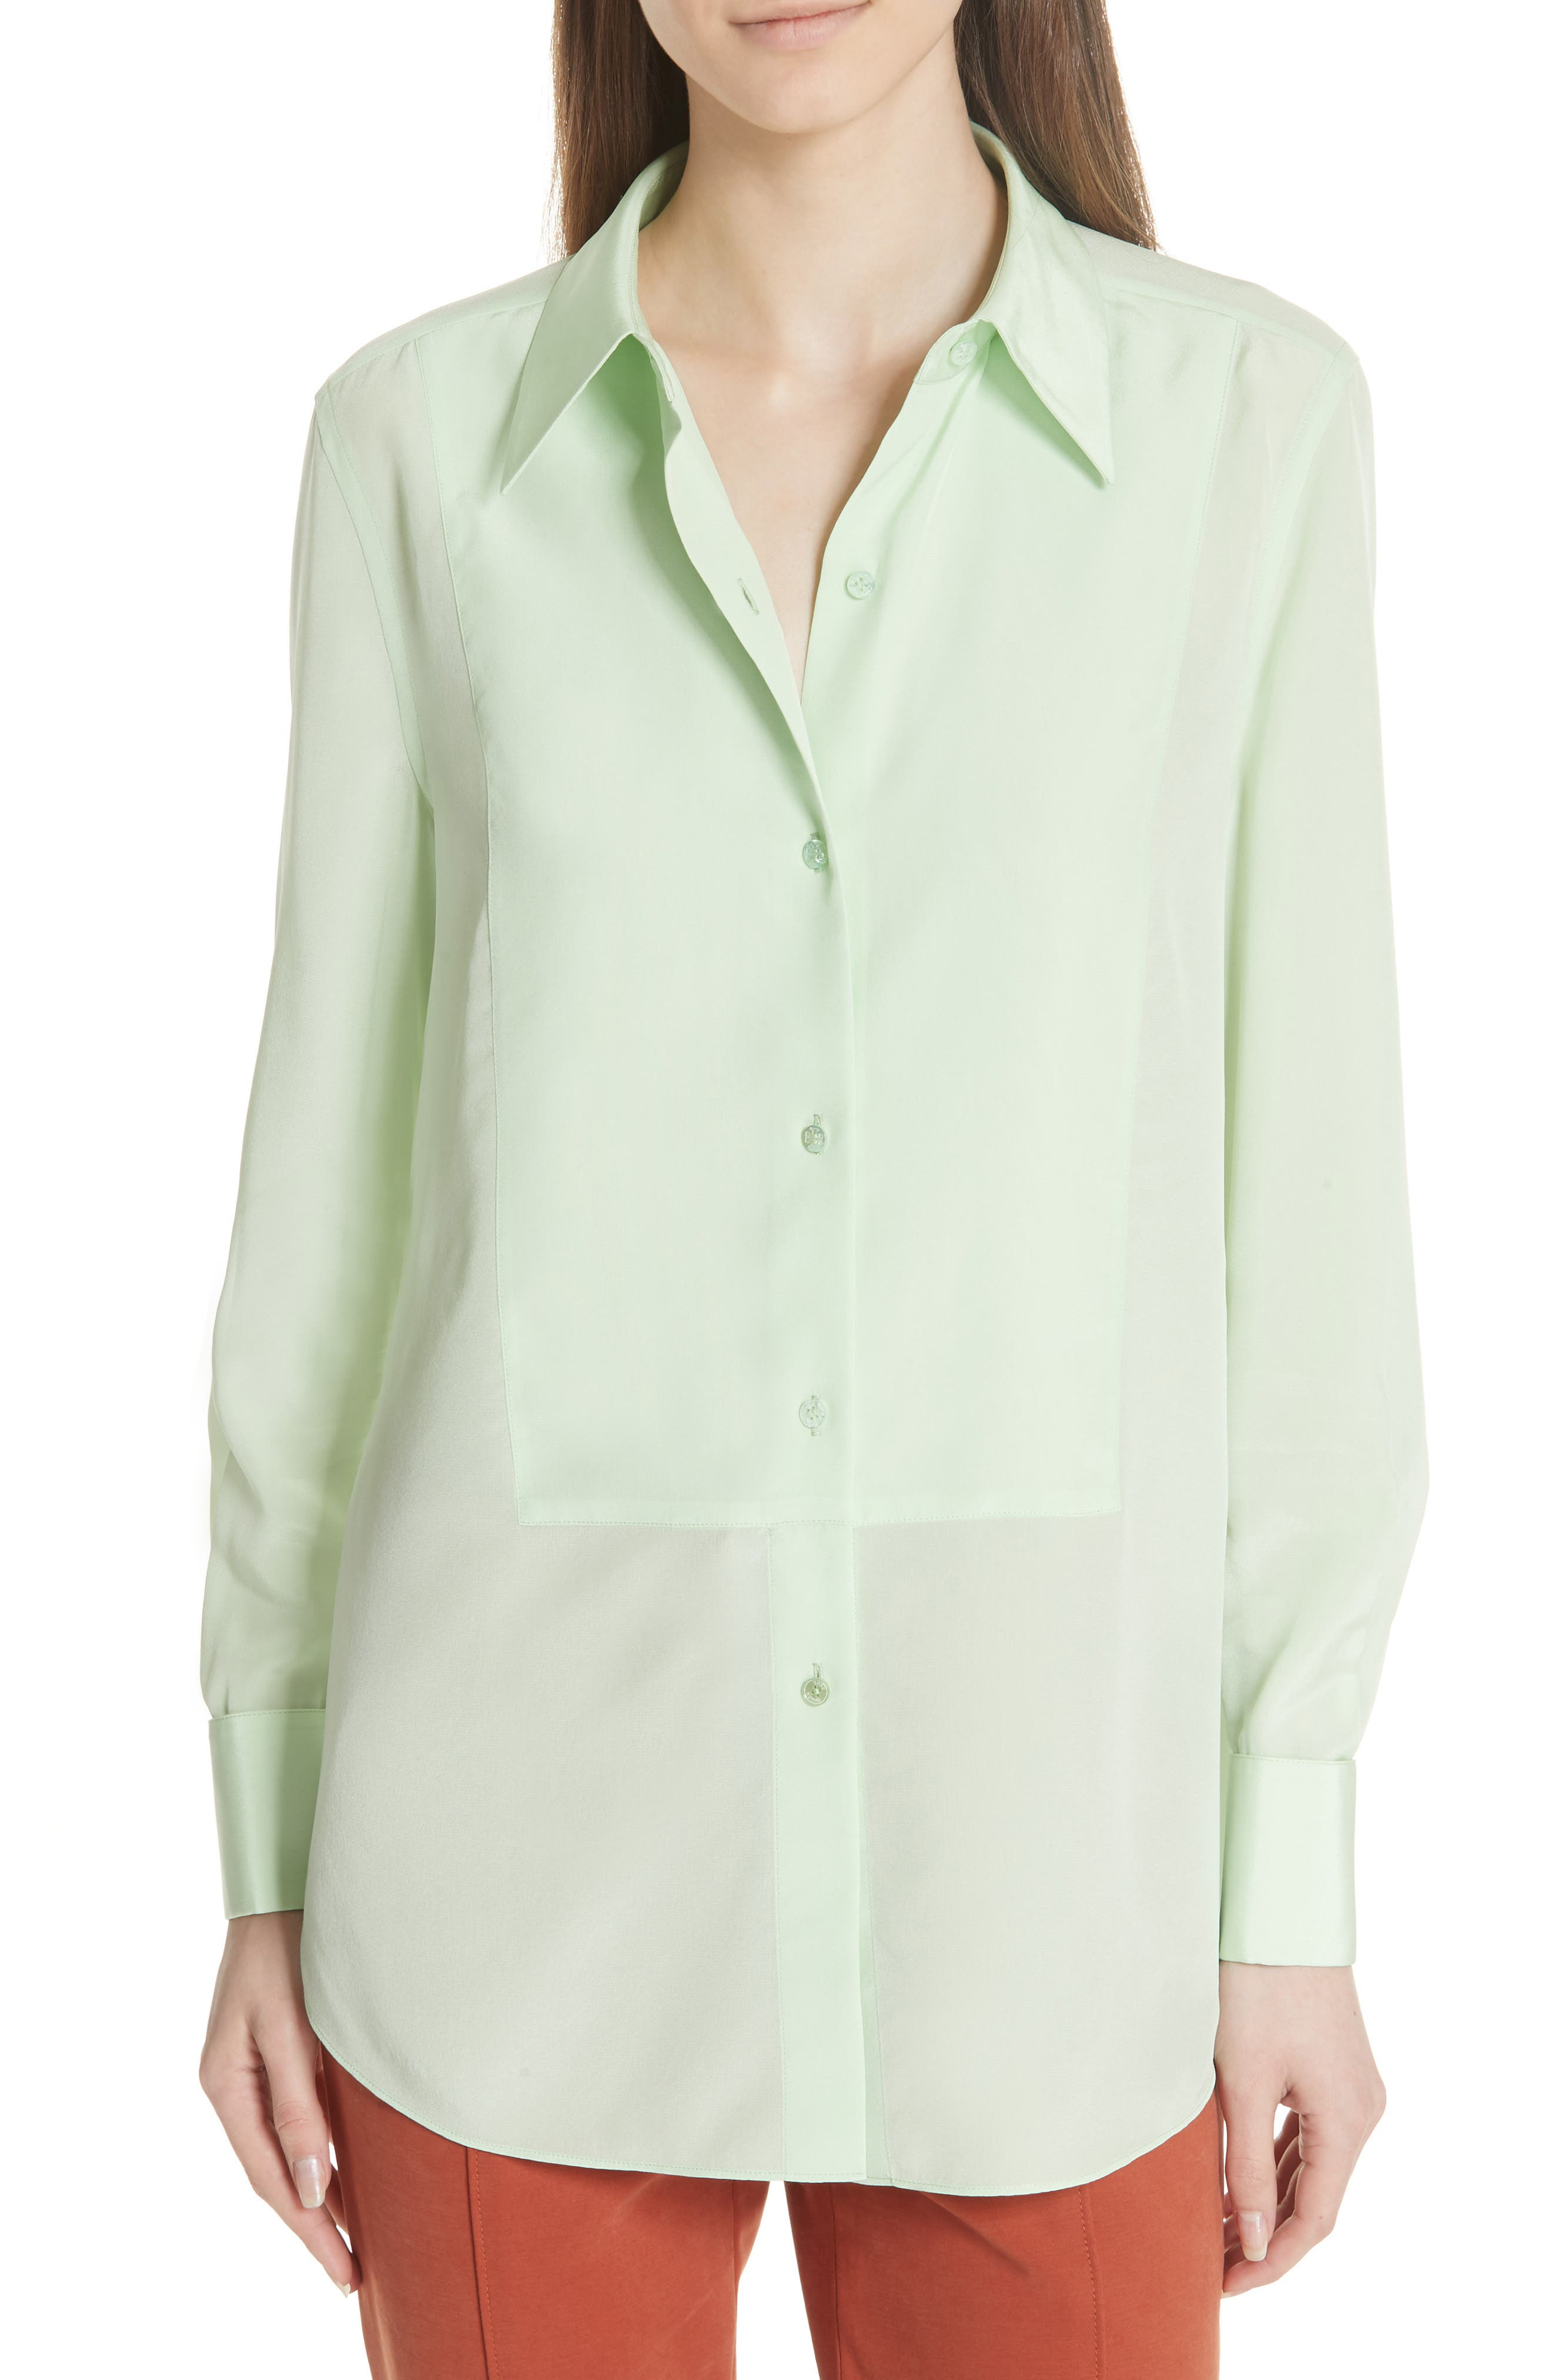 Janet Silk Top,                         Main,                         color, 338